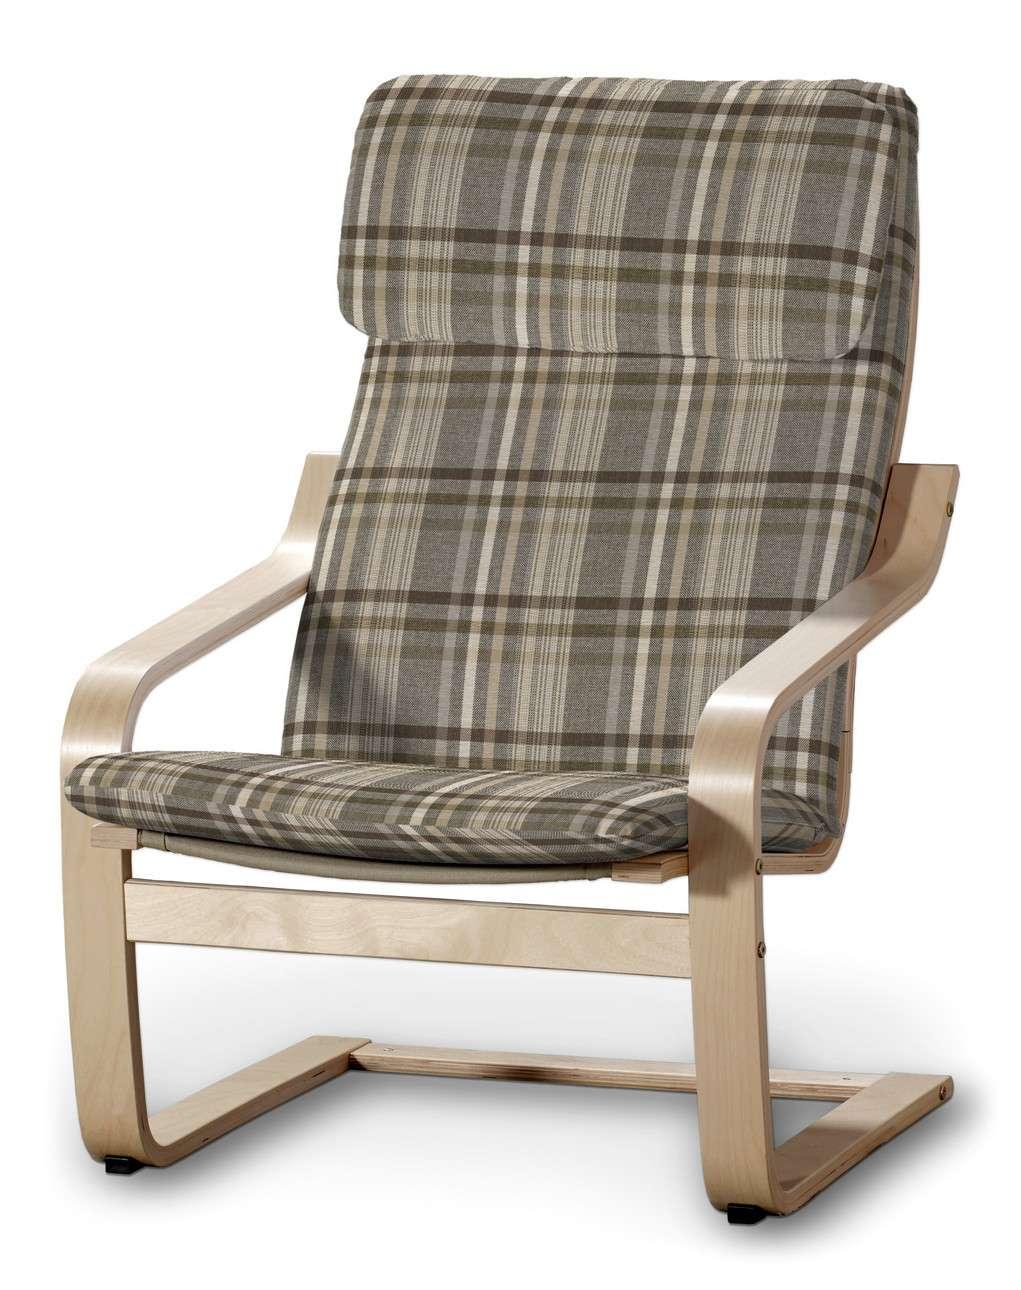 Poduszka na fotel Poäng w kolekcji Edinburgh, tkanina: 703-17